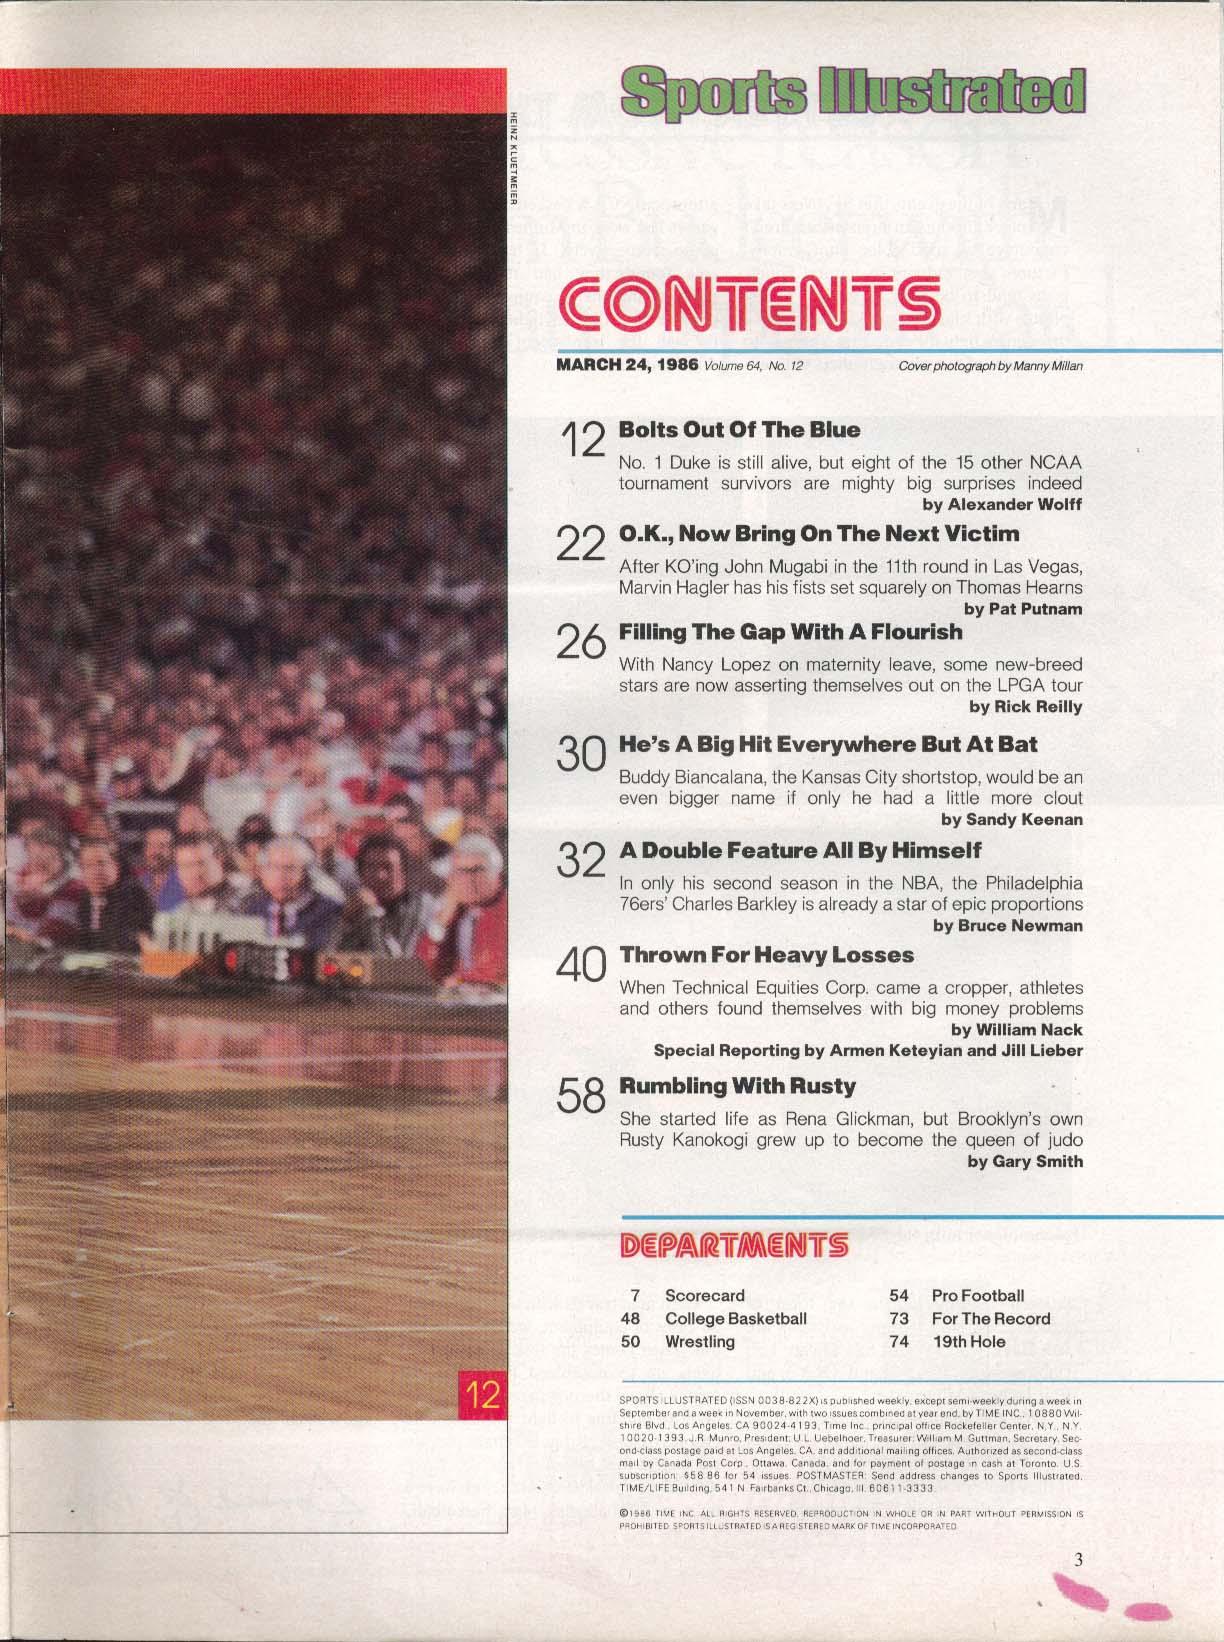 SPORTS ILLUSTRATED Marvin Hagler John Mugabi Nancy Lopez NCAA 3/24 1986